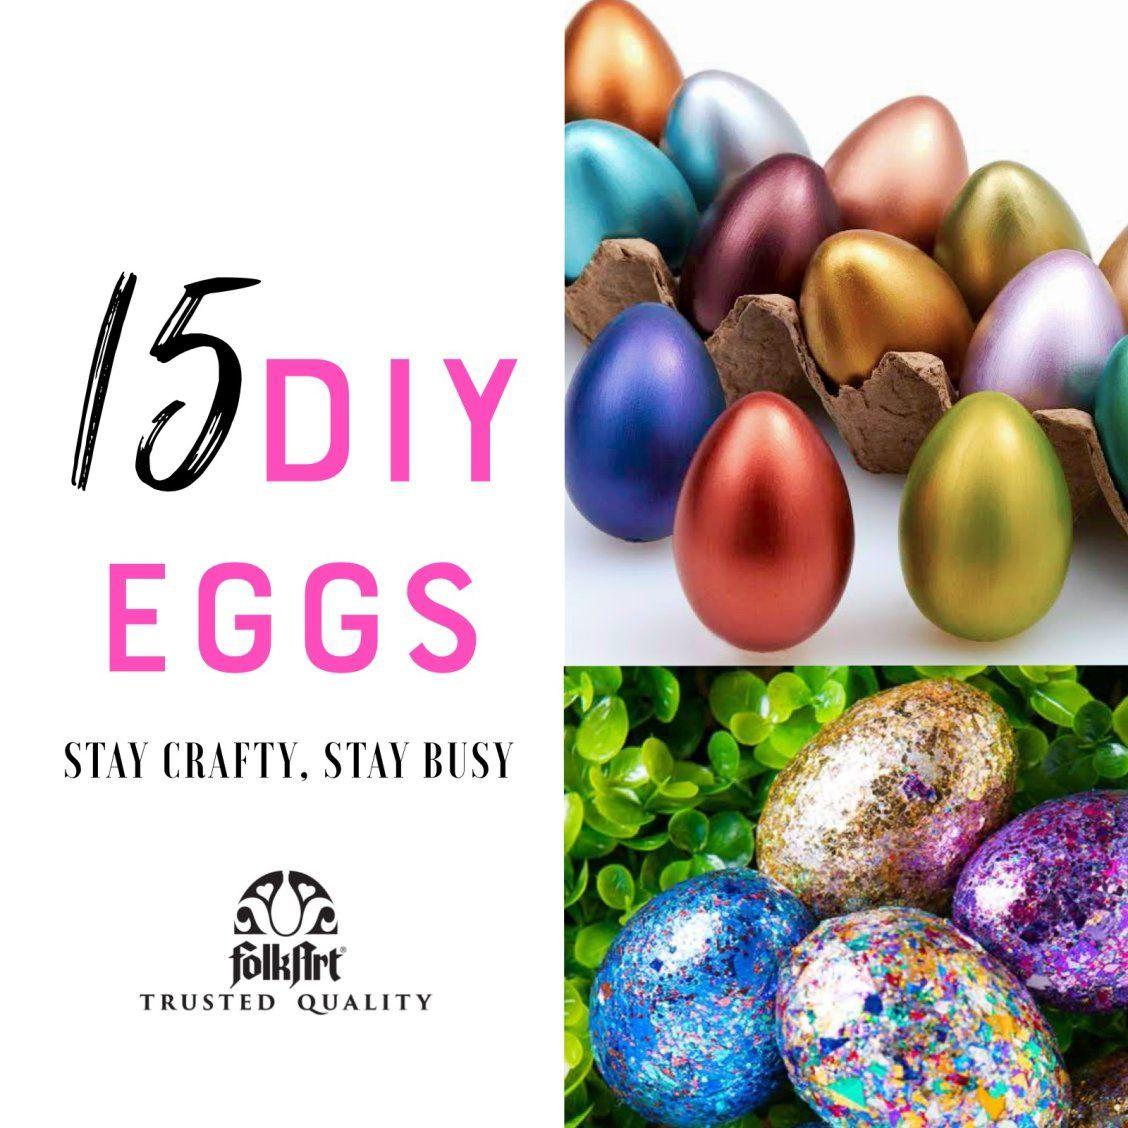 15 Super Cute Diy Easter Egg Decorating Ideas Fun Indoor Easter Celebration And Craft Diys For An At Home Easter Craft Decorations Easter Eggs Diy Easter Diy